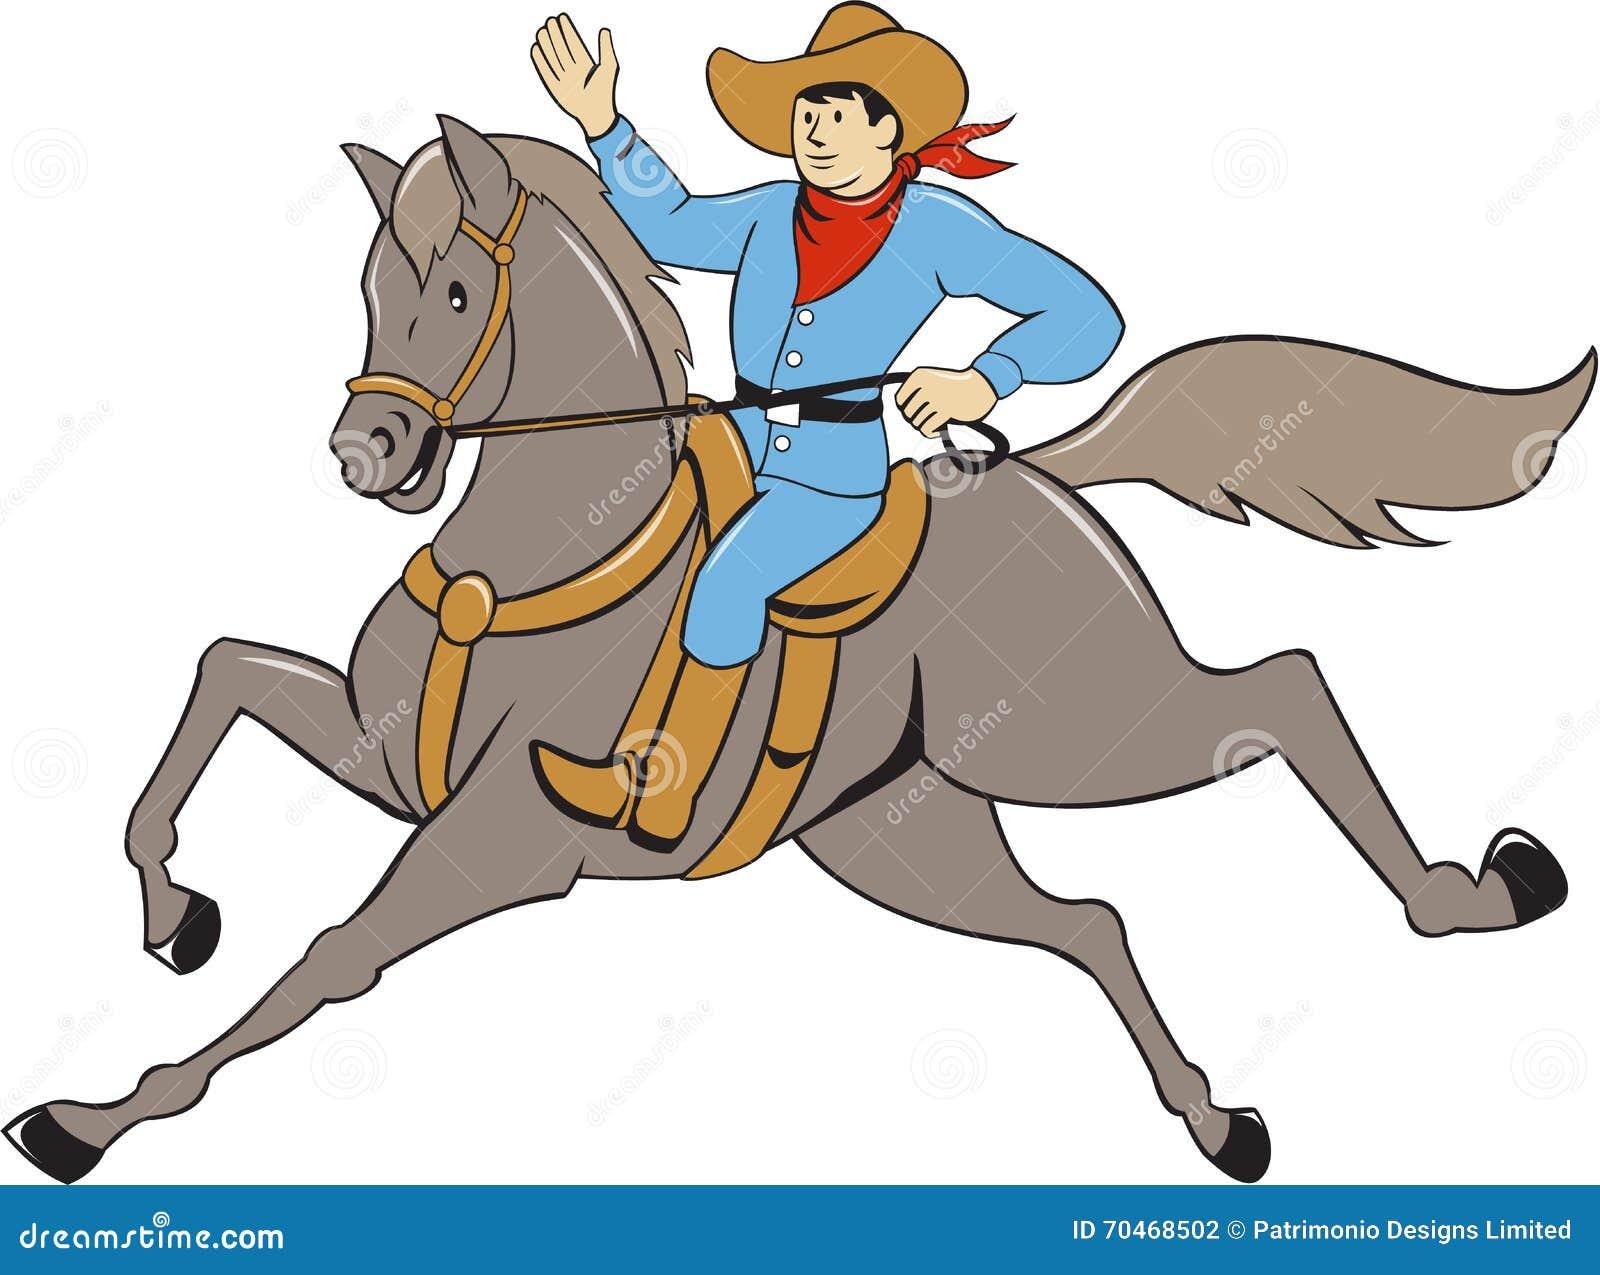 Cowboy Riding Horse Waving Cartoon Stock Vector Illustration Of